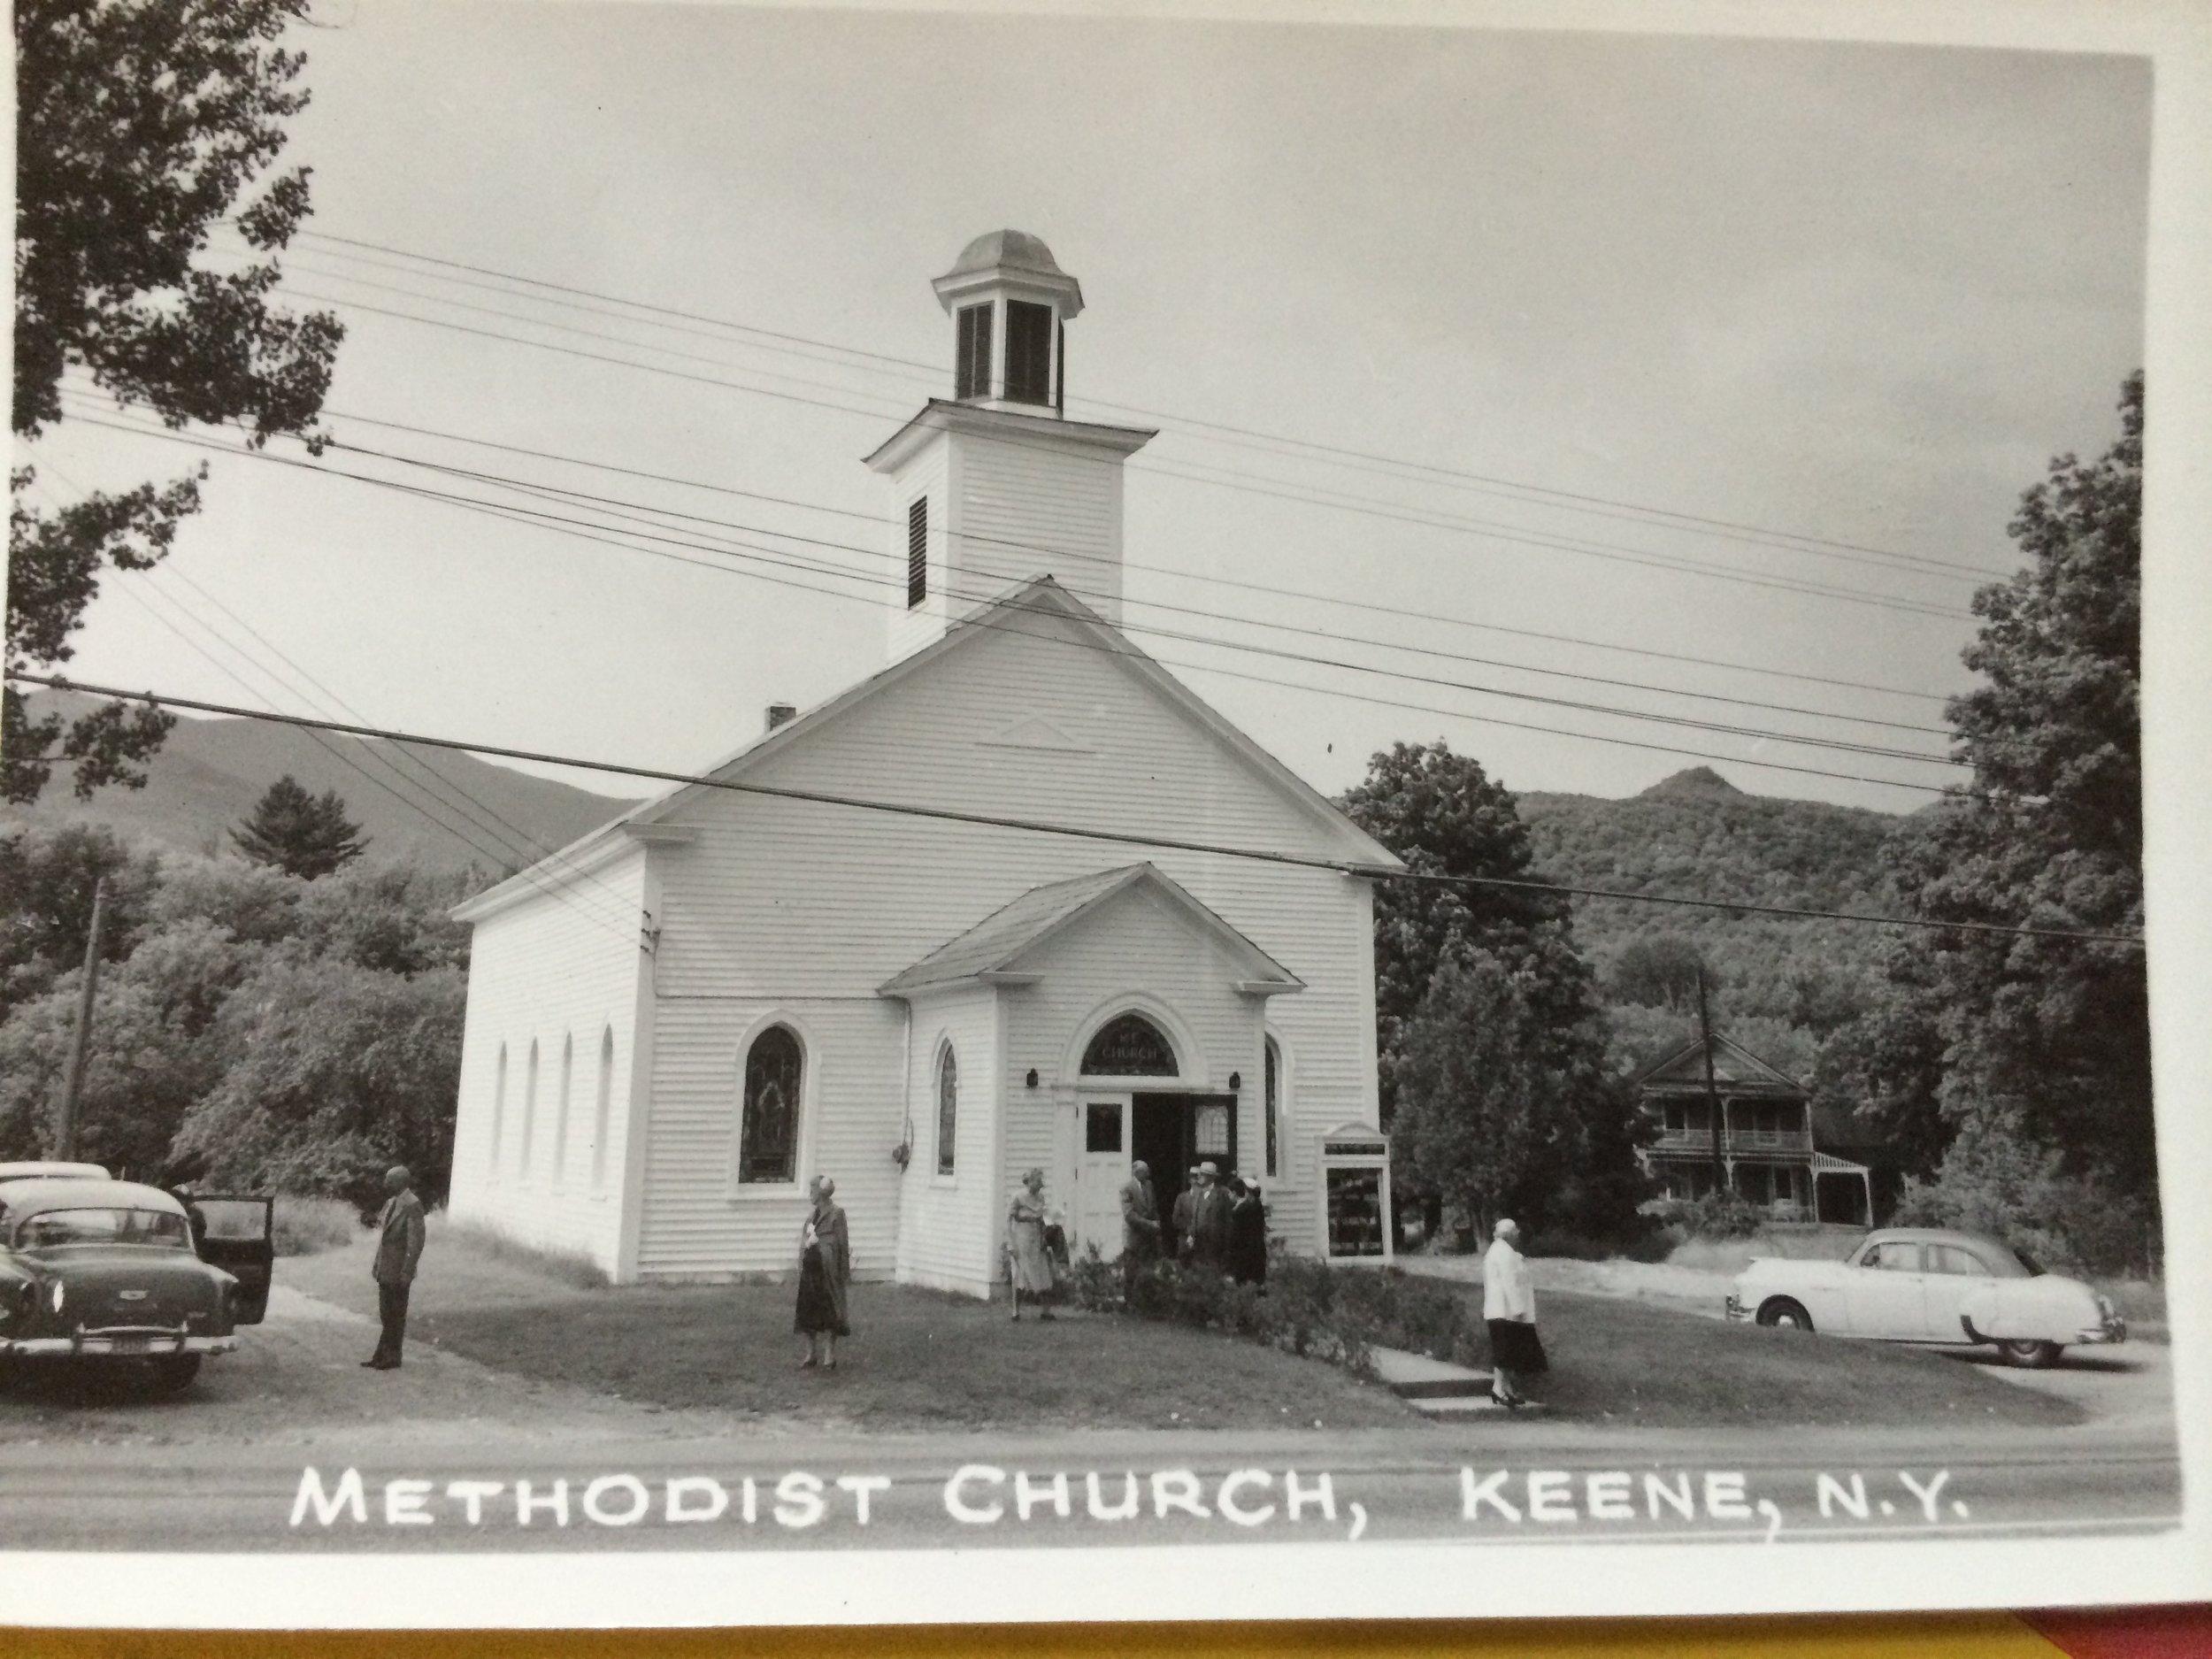 church_1950s.JPG